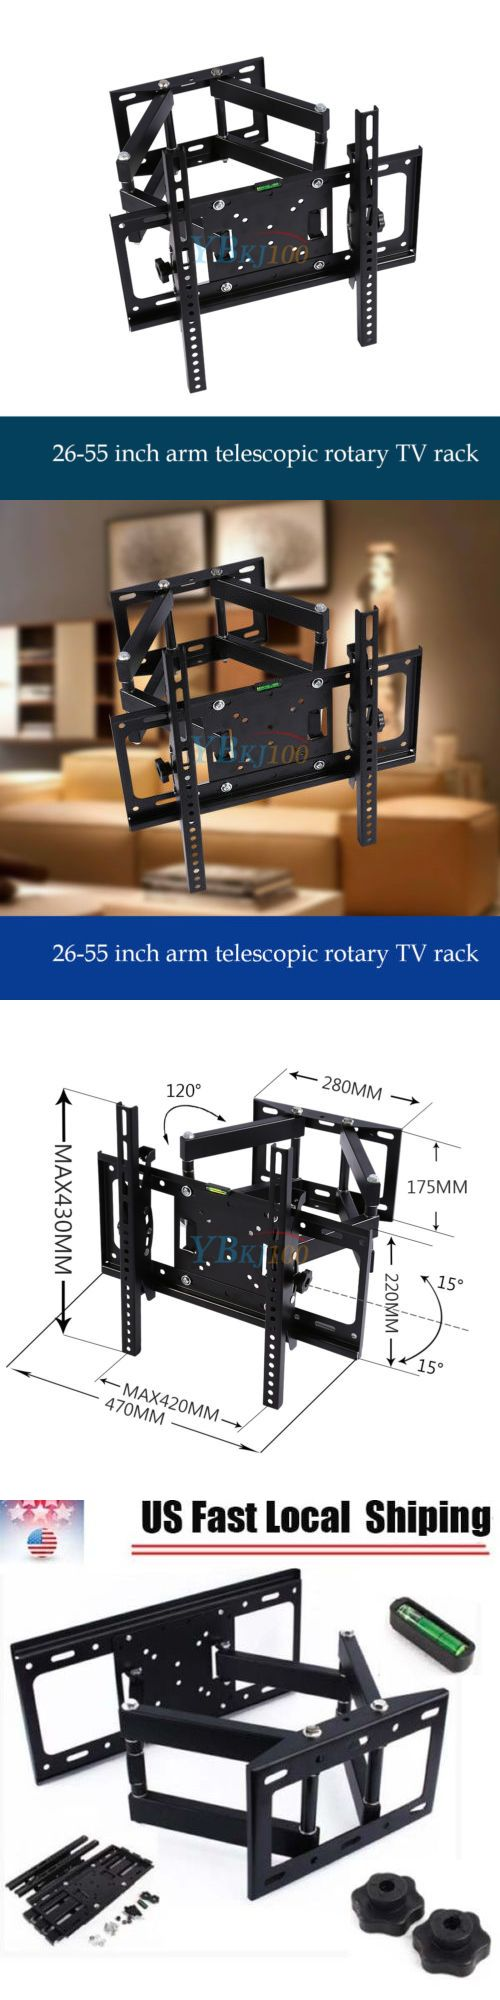 TV Mounts and Brackets: Full Motion Tilt And Swivel Led Lcd Tv Wall Mount Bracket 26 32 37 40 42 50 55 In -> BUY IT NOW ONLY: $31.99 on eBay!